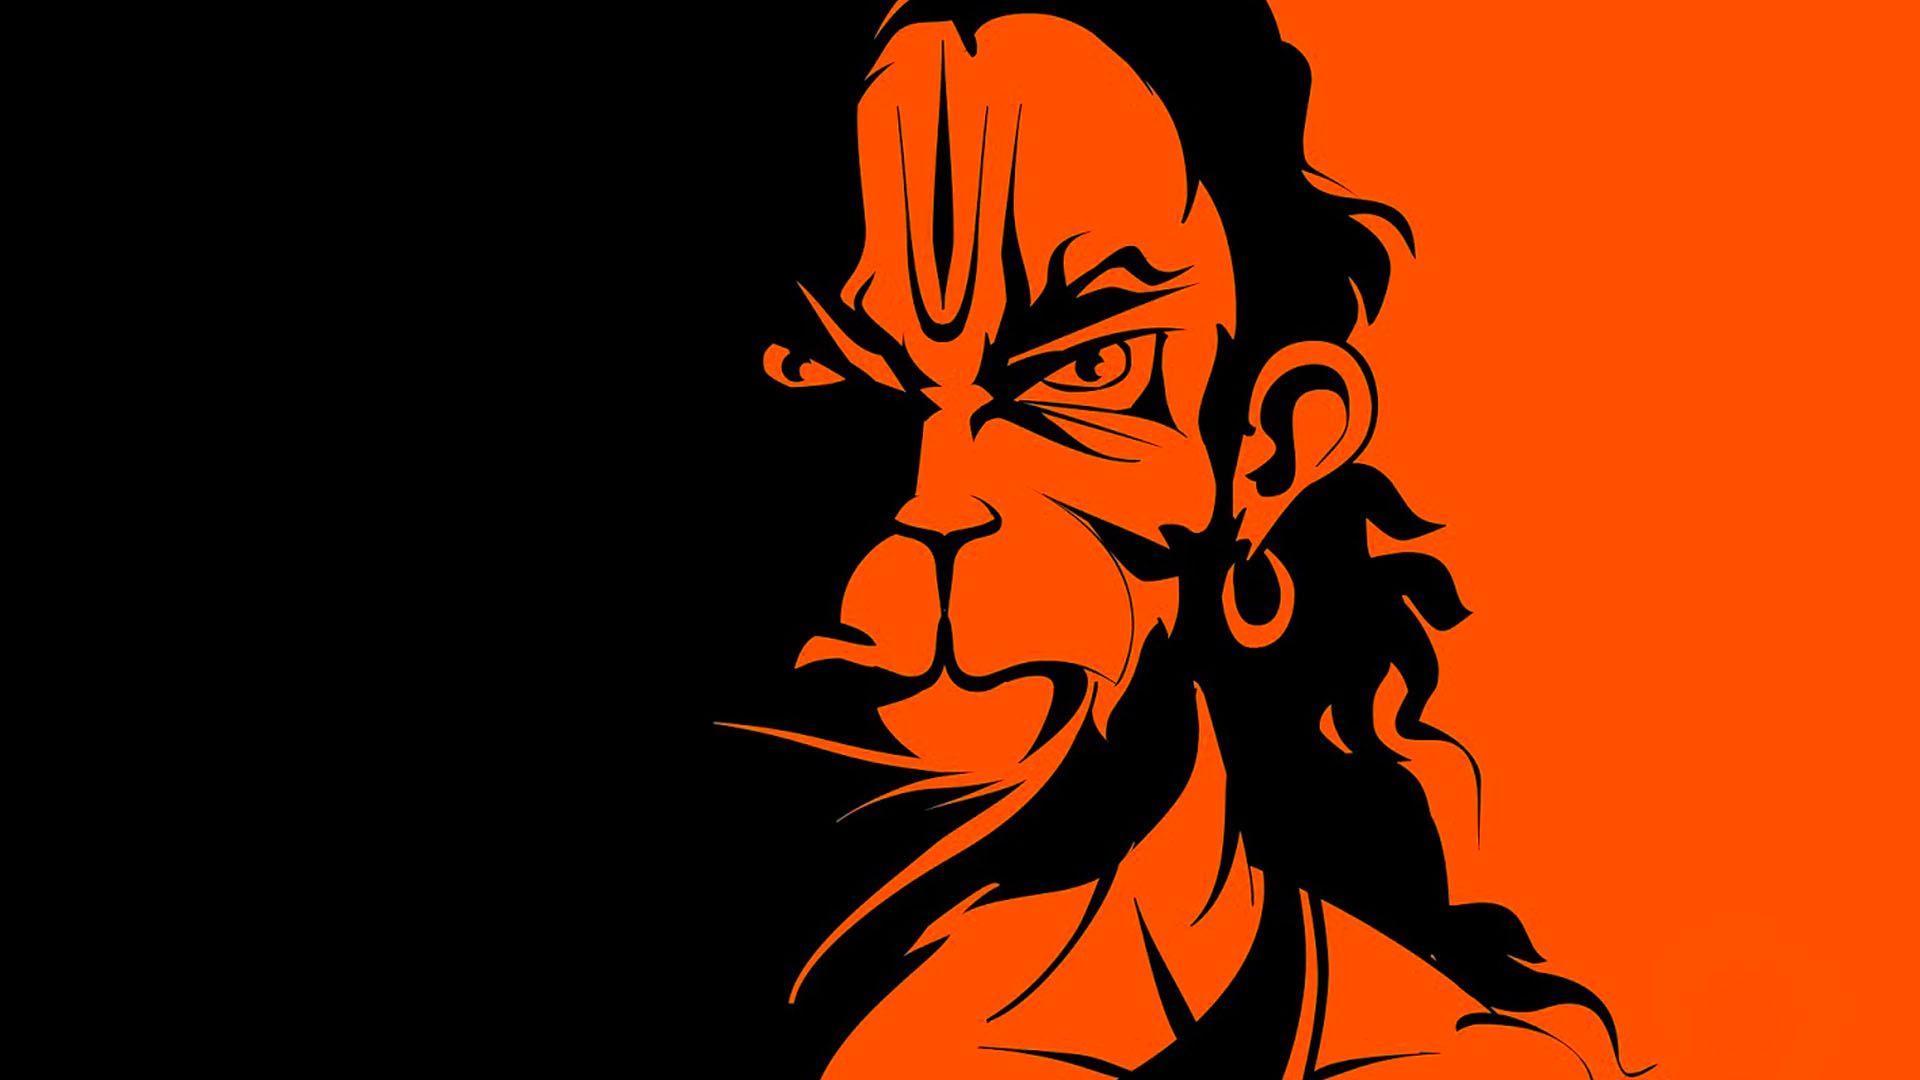 Hanumanji Vector Hanumanji Hanuman Images Hanuman Photos